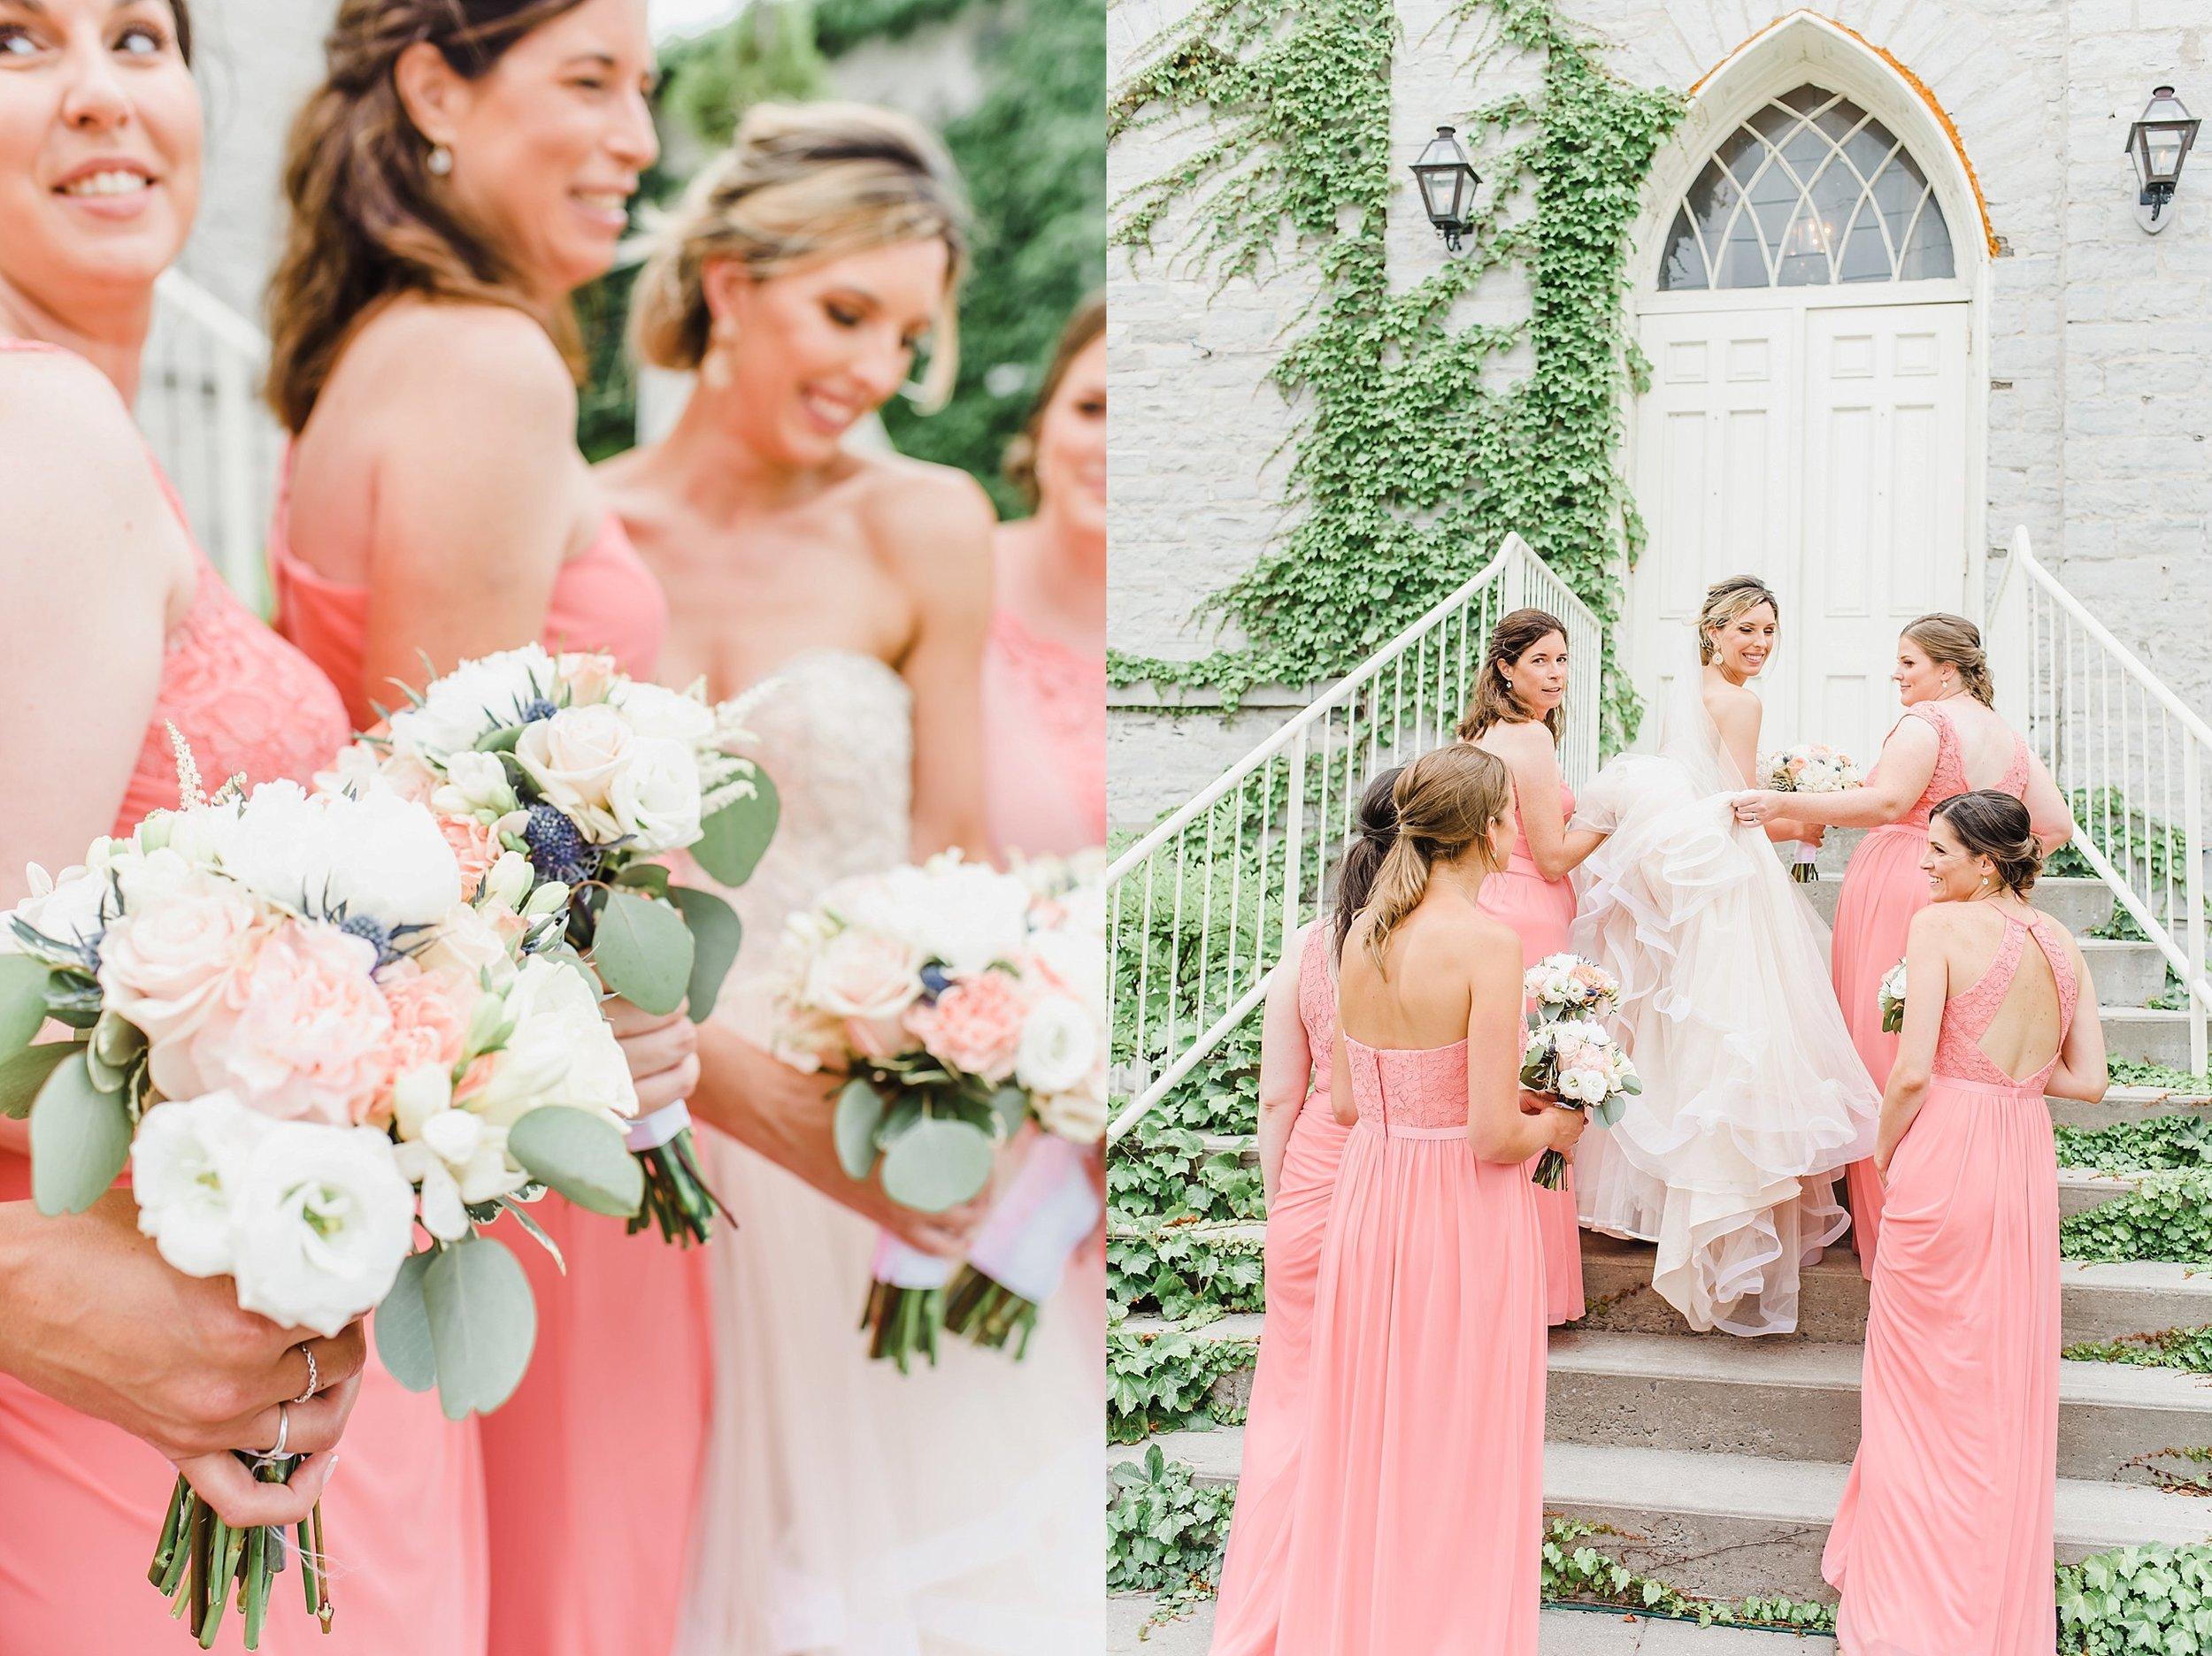 light airy indie fine art ottawa wedding photographer | Ali and Batoul Photography_0202.jpg